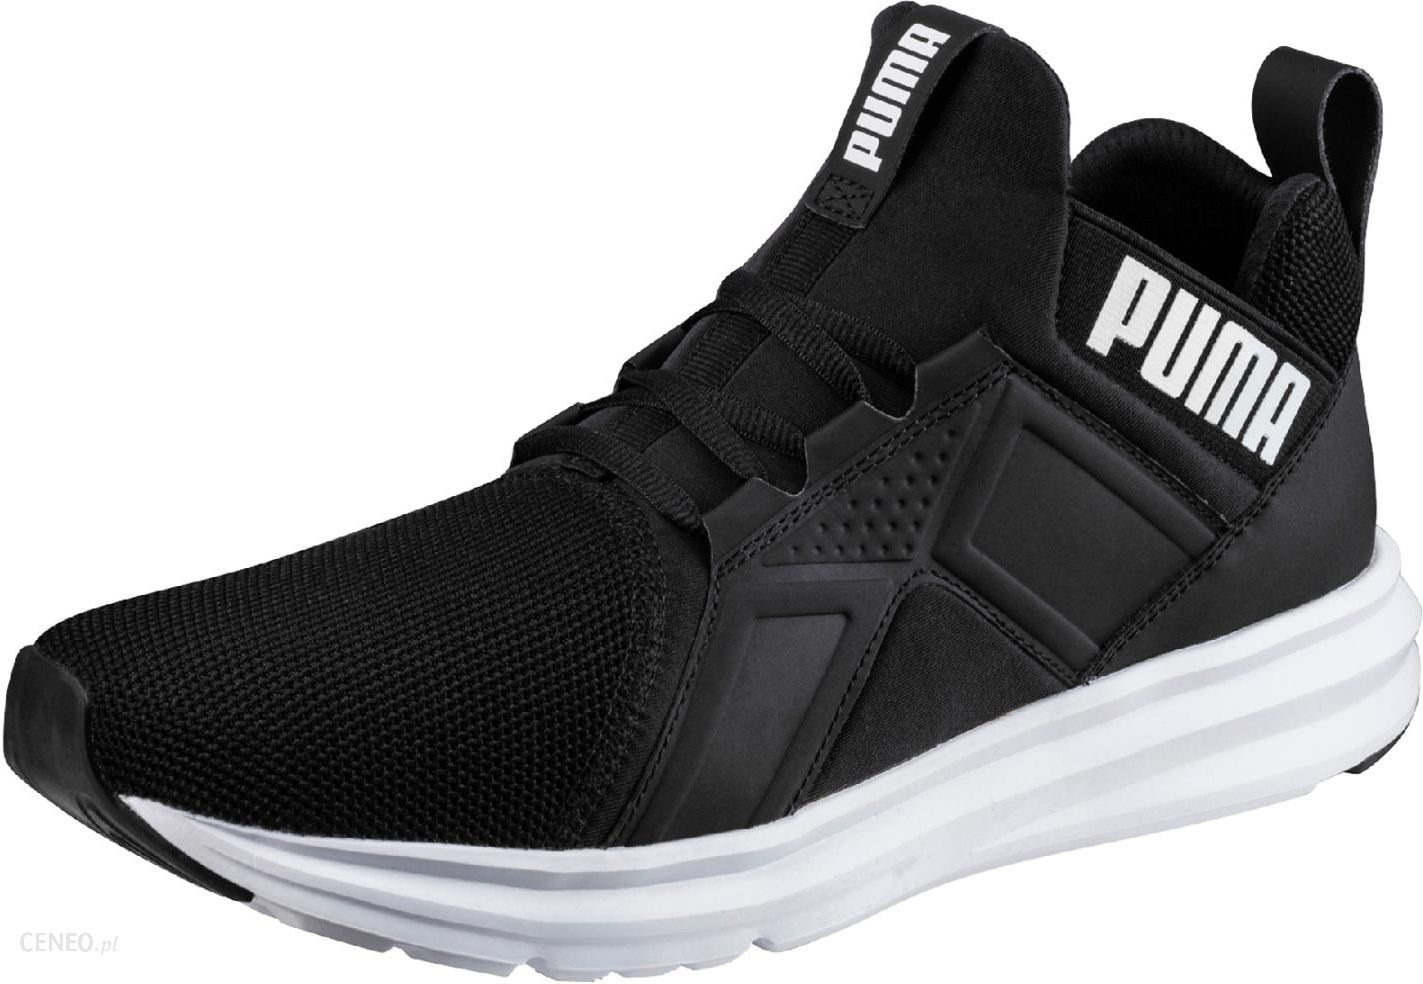 Puma buty Enzo Mesh Black White 43 Ceny i opinie Ceneo.pl